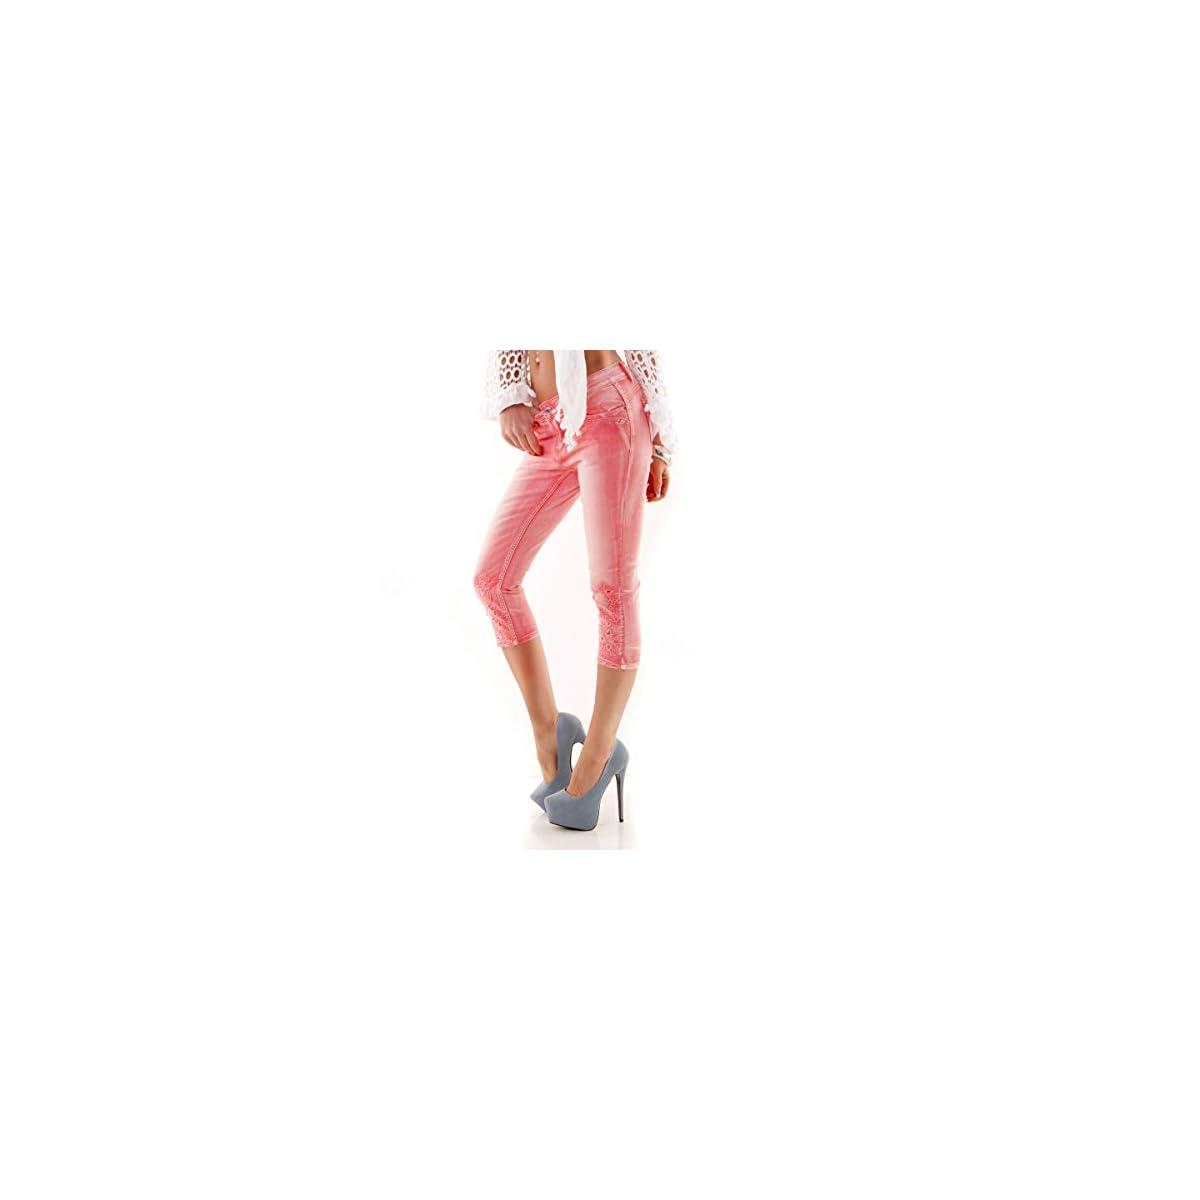 Mozzaar New Brand Pant Skinny Jeans Röhre Miss Push